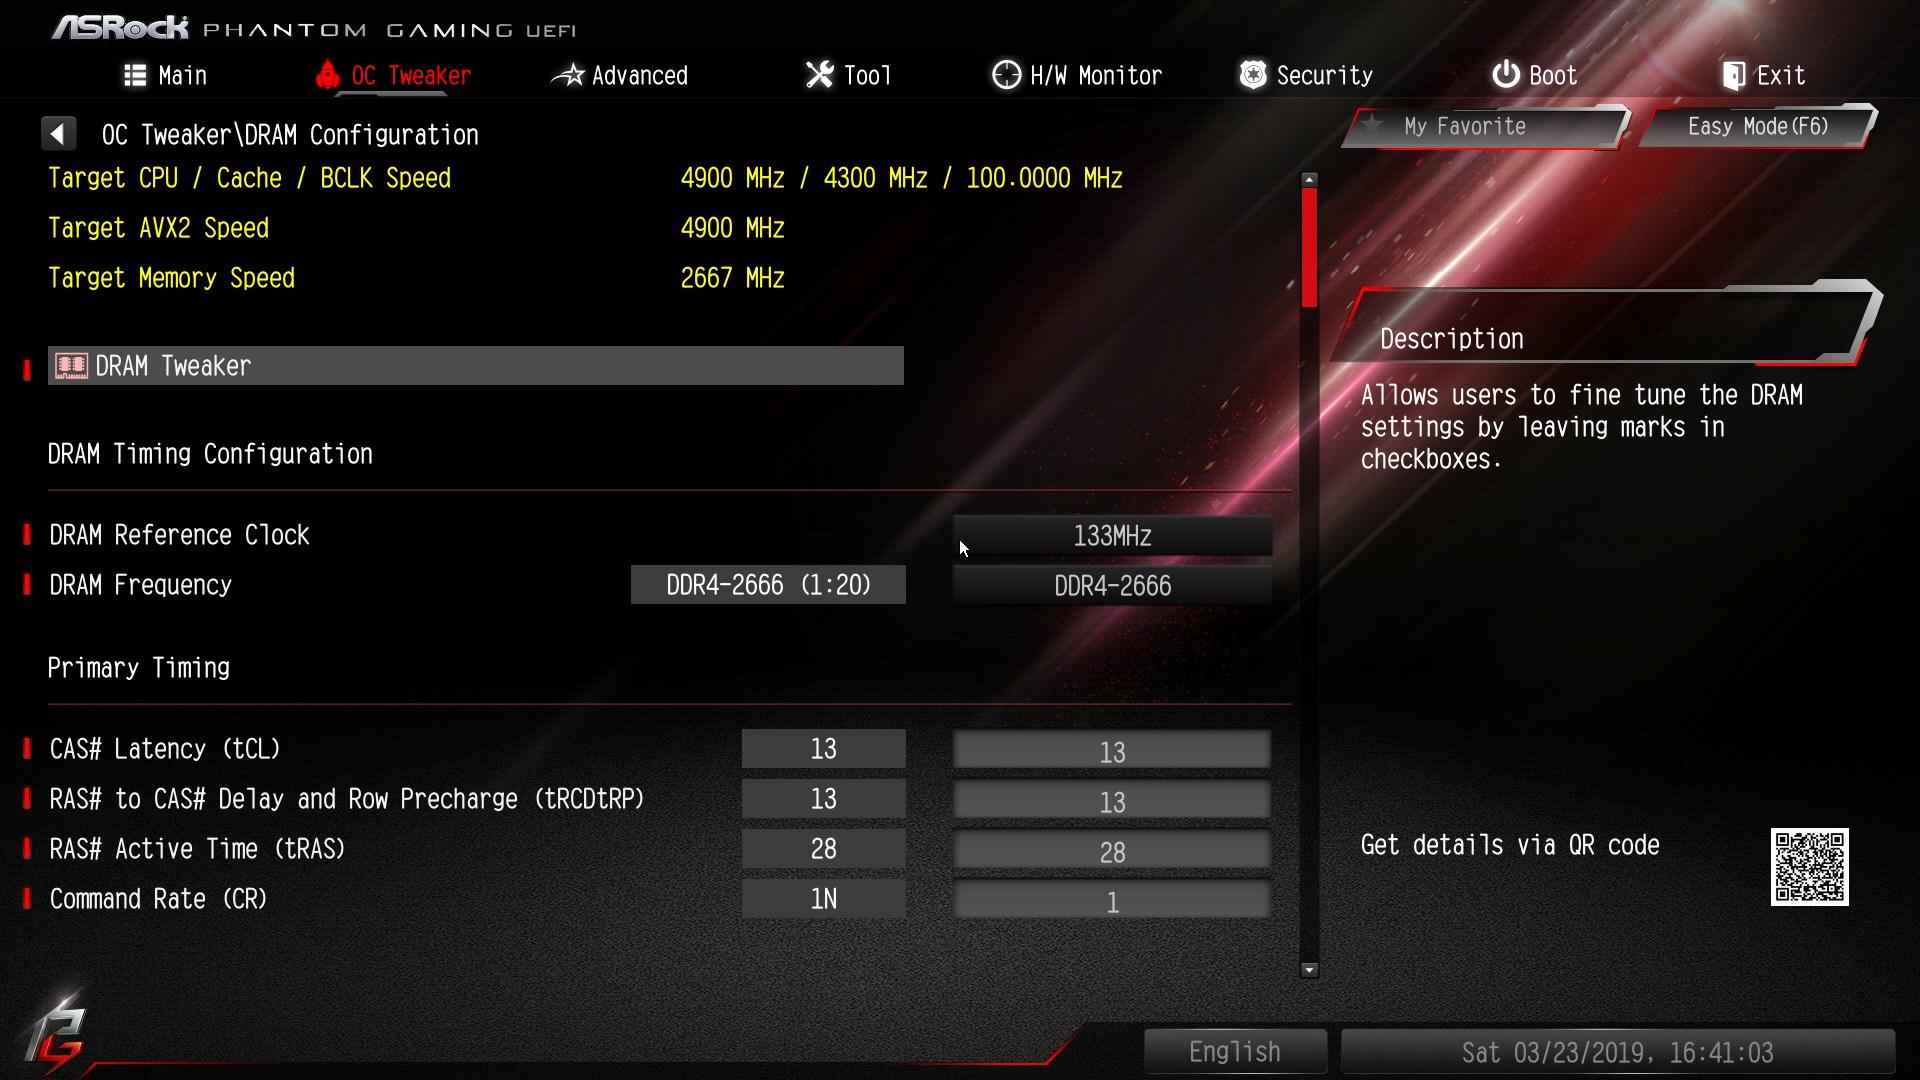 ASRock B365M Phantom Gaming 4 Motherboard Review - Page 4 of 9